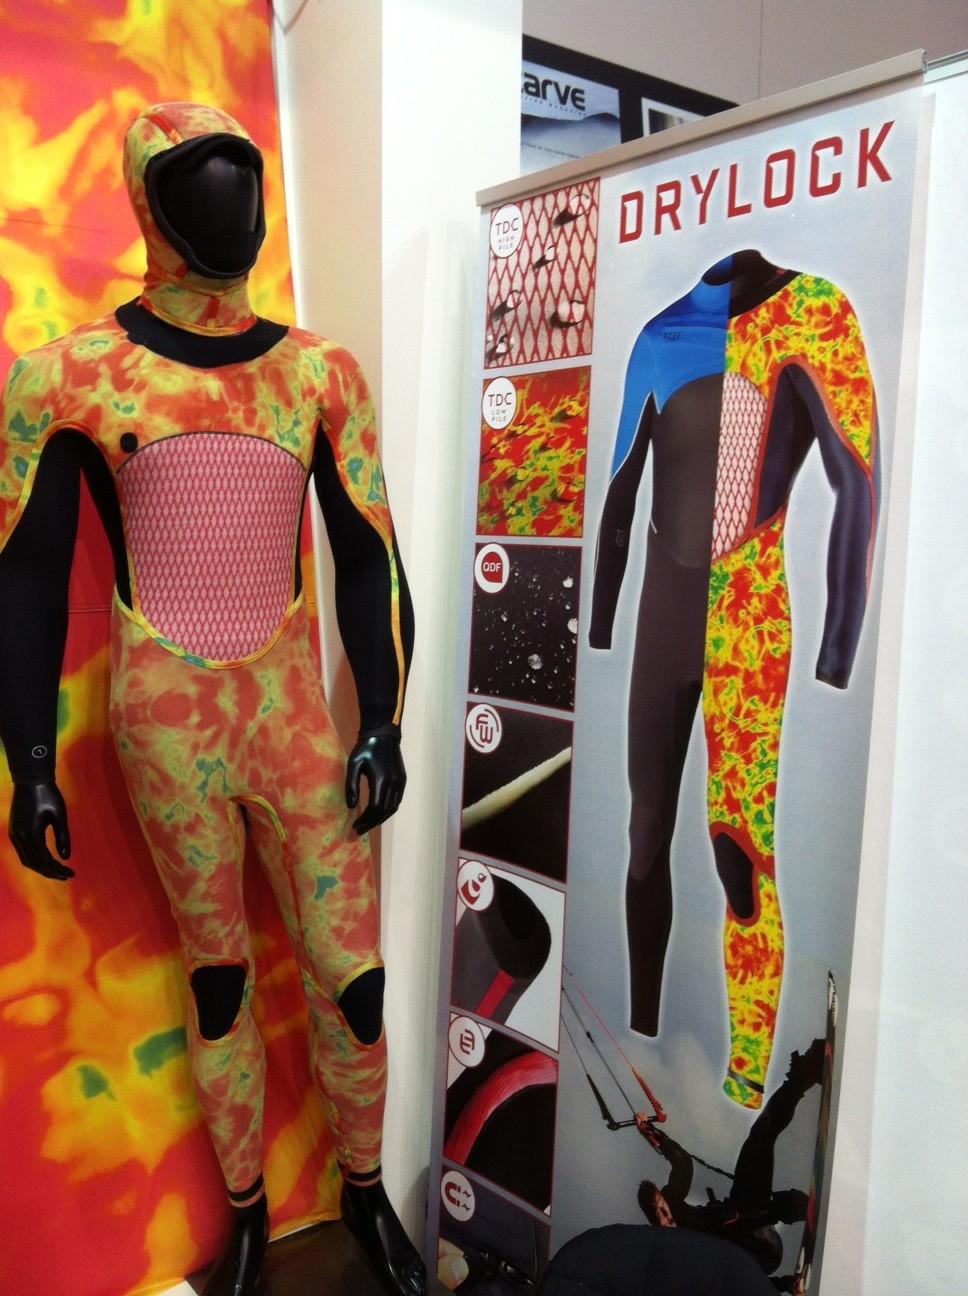 Der Xcel Drylock